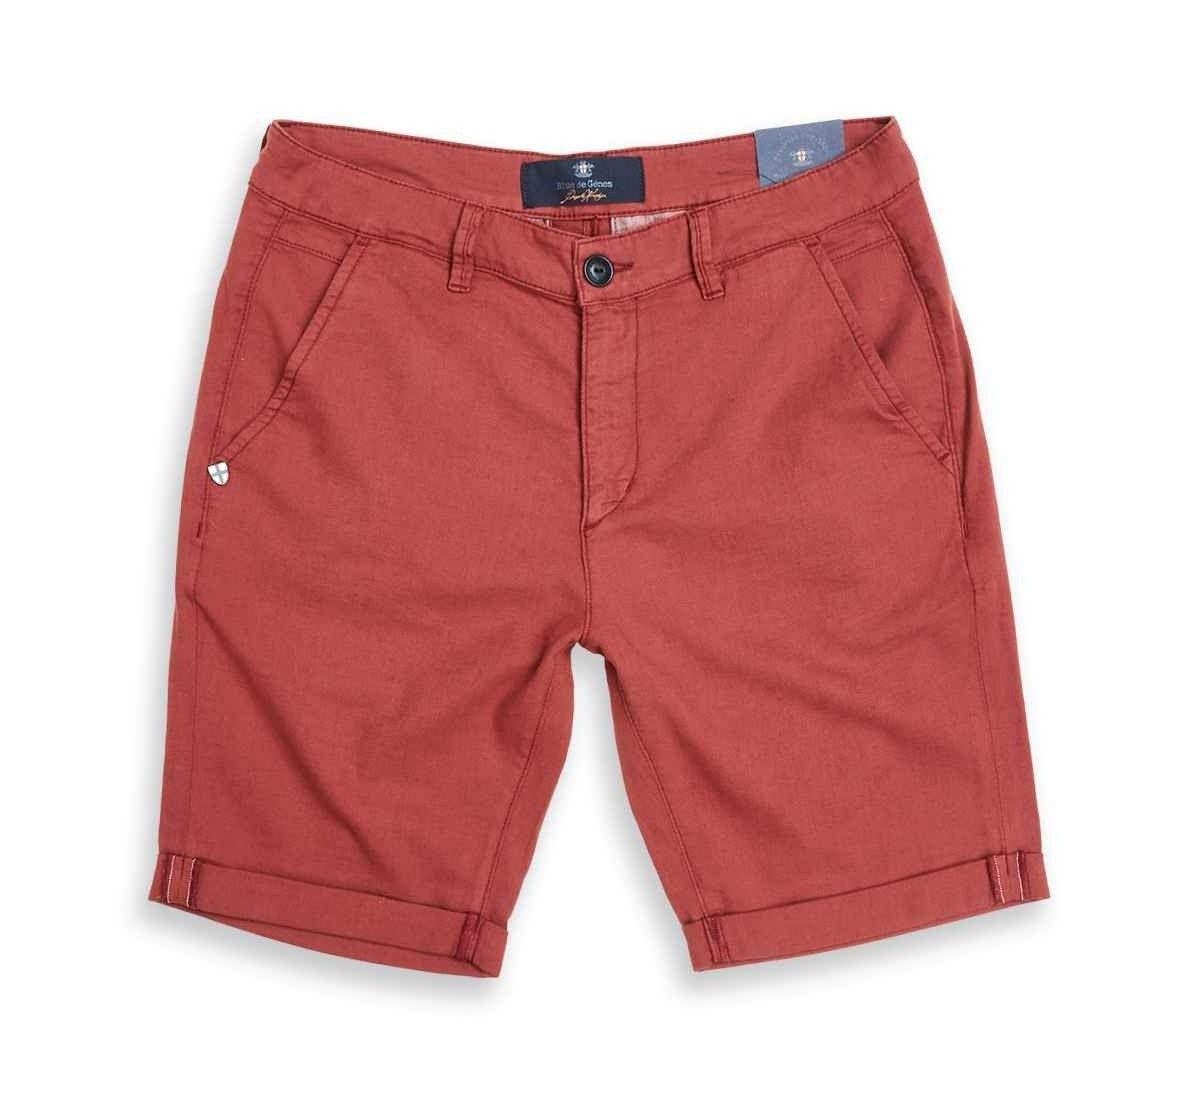 BLUE DE GÊNES - Herren Shorts - Teo Gusto Shorts - Burned Henna